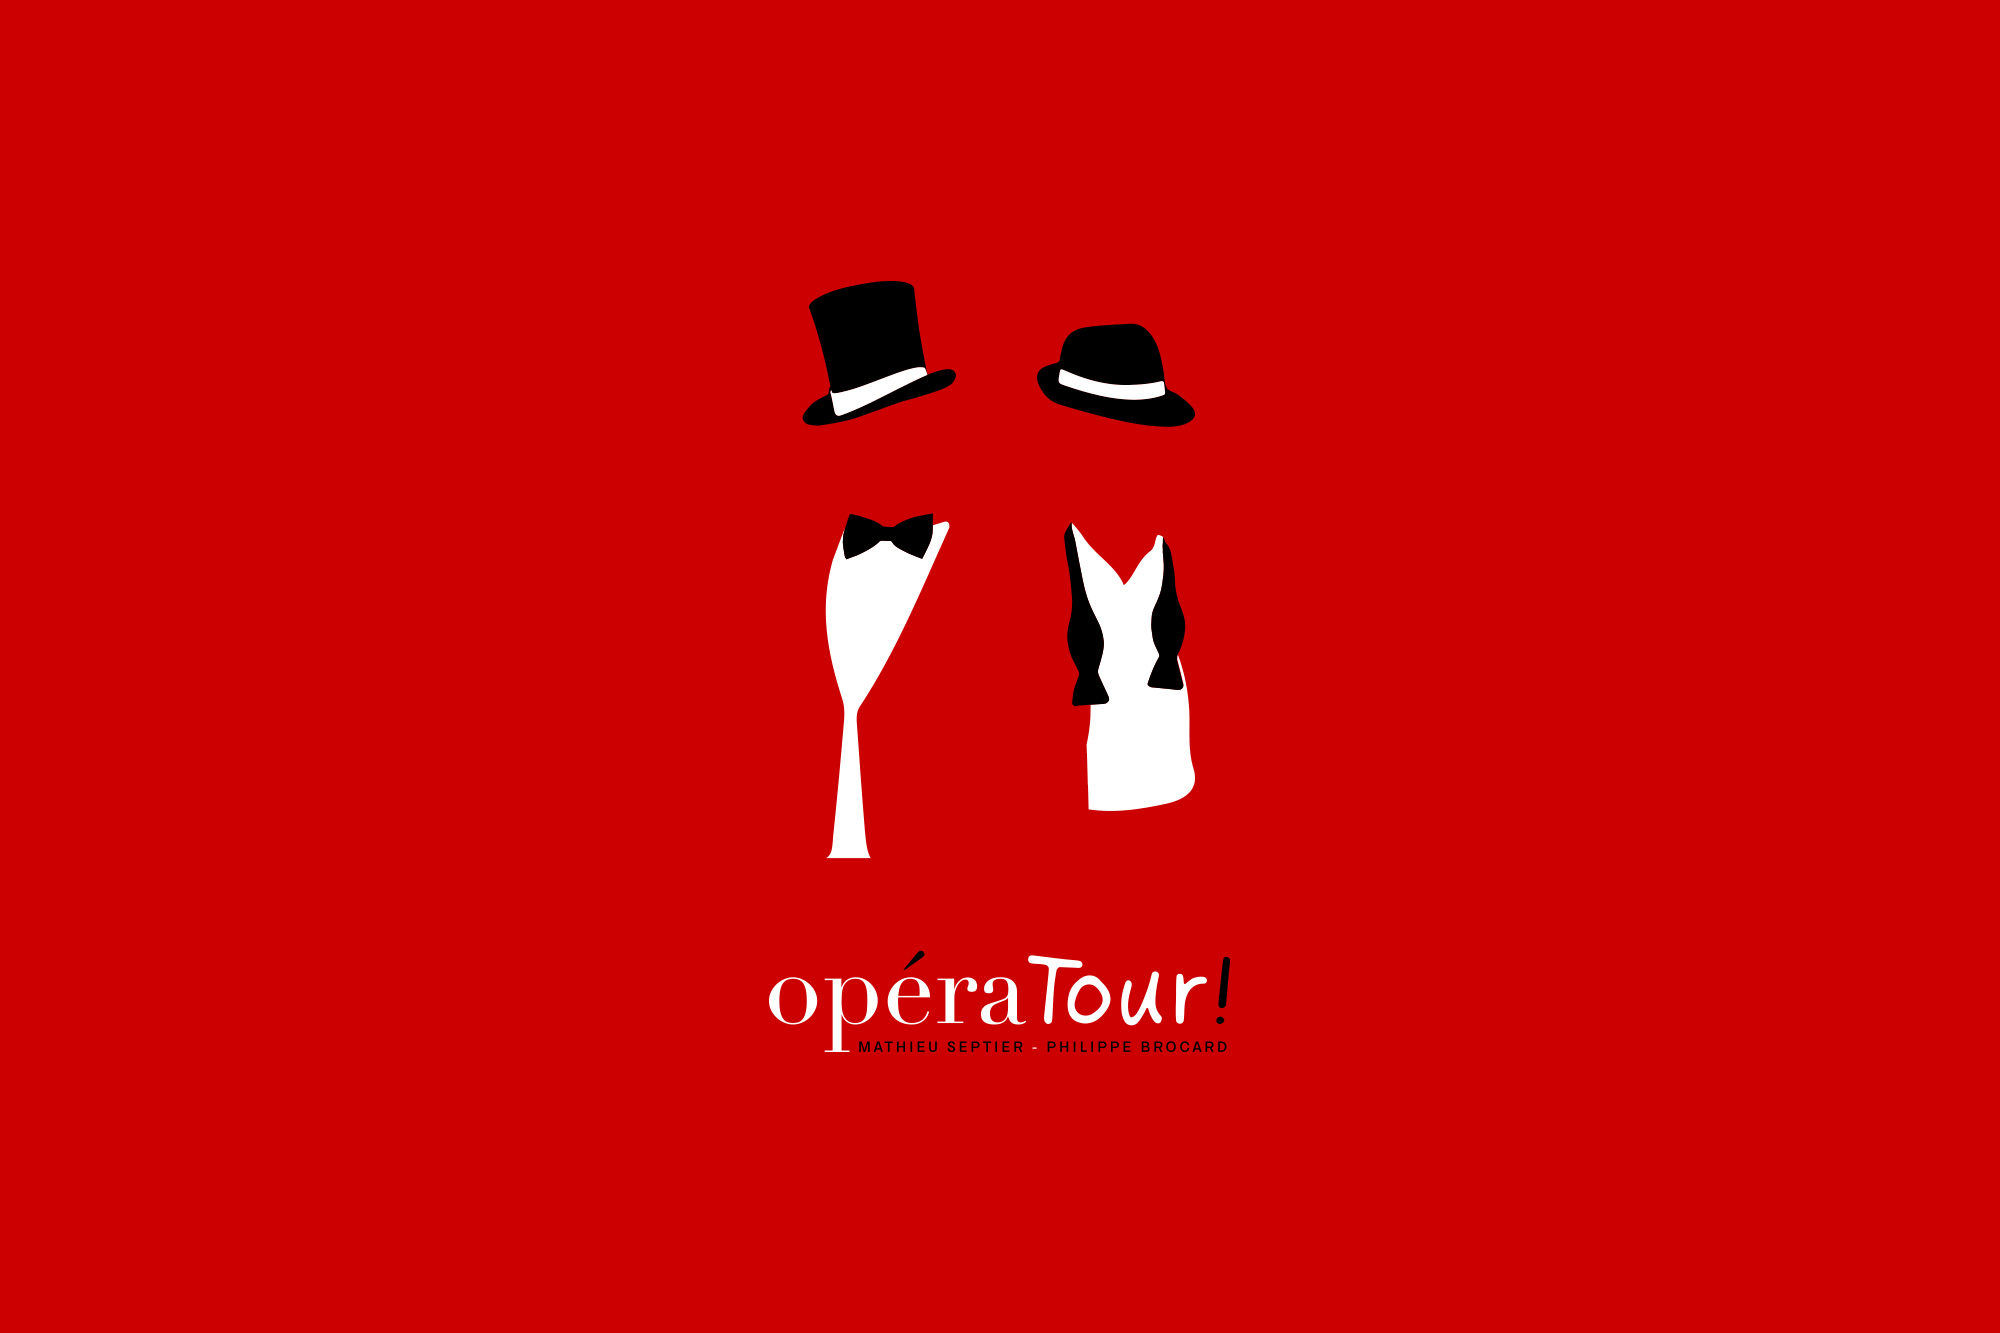 quentin_paquignon-branding-visual_identity-opératour_06.jpg